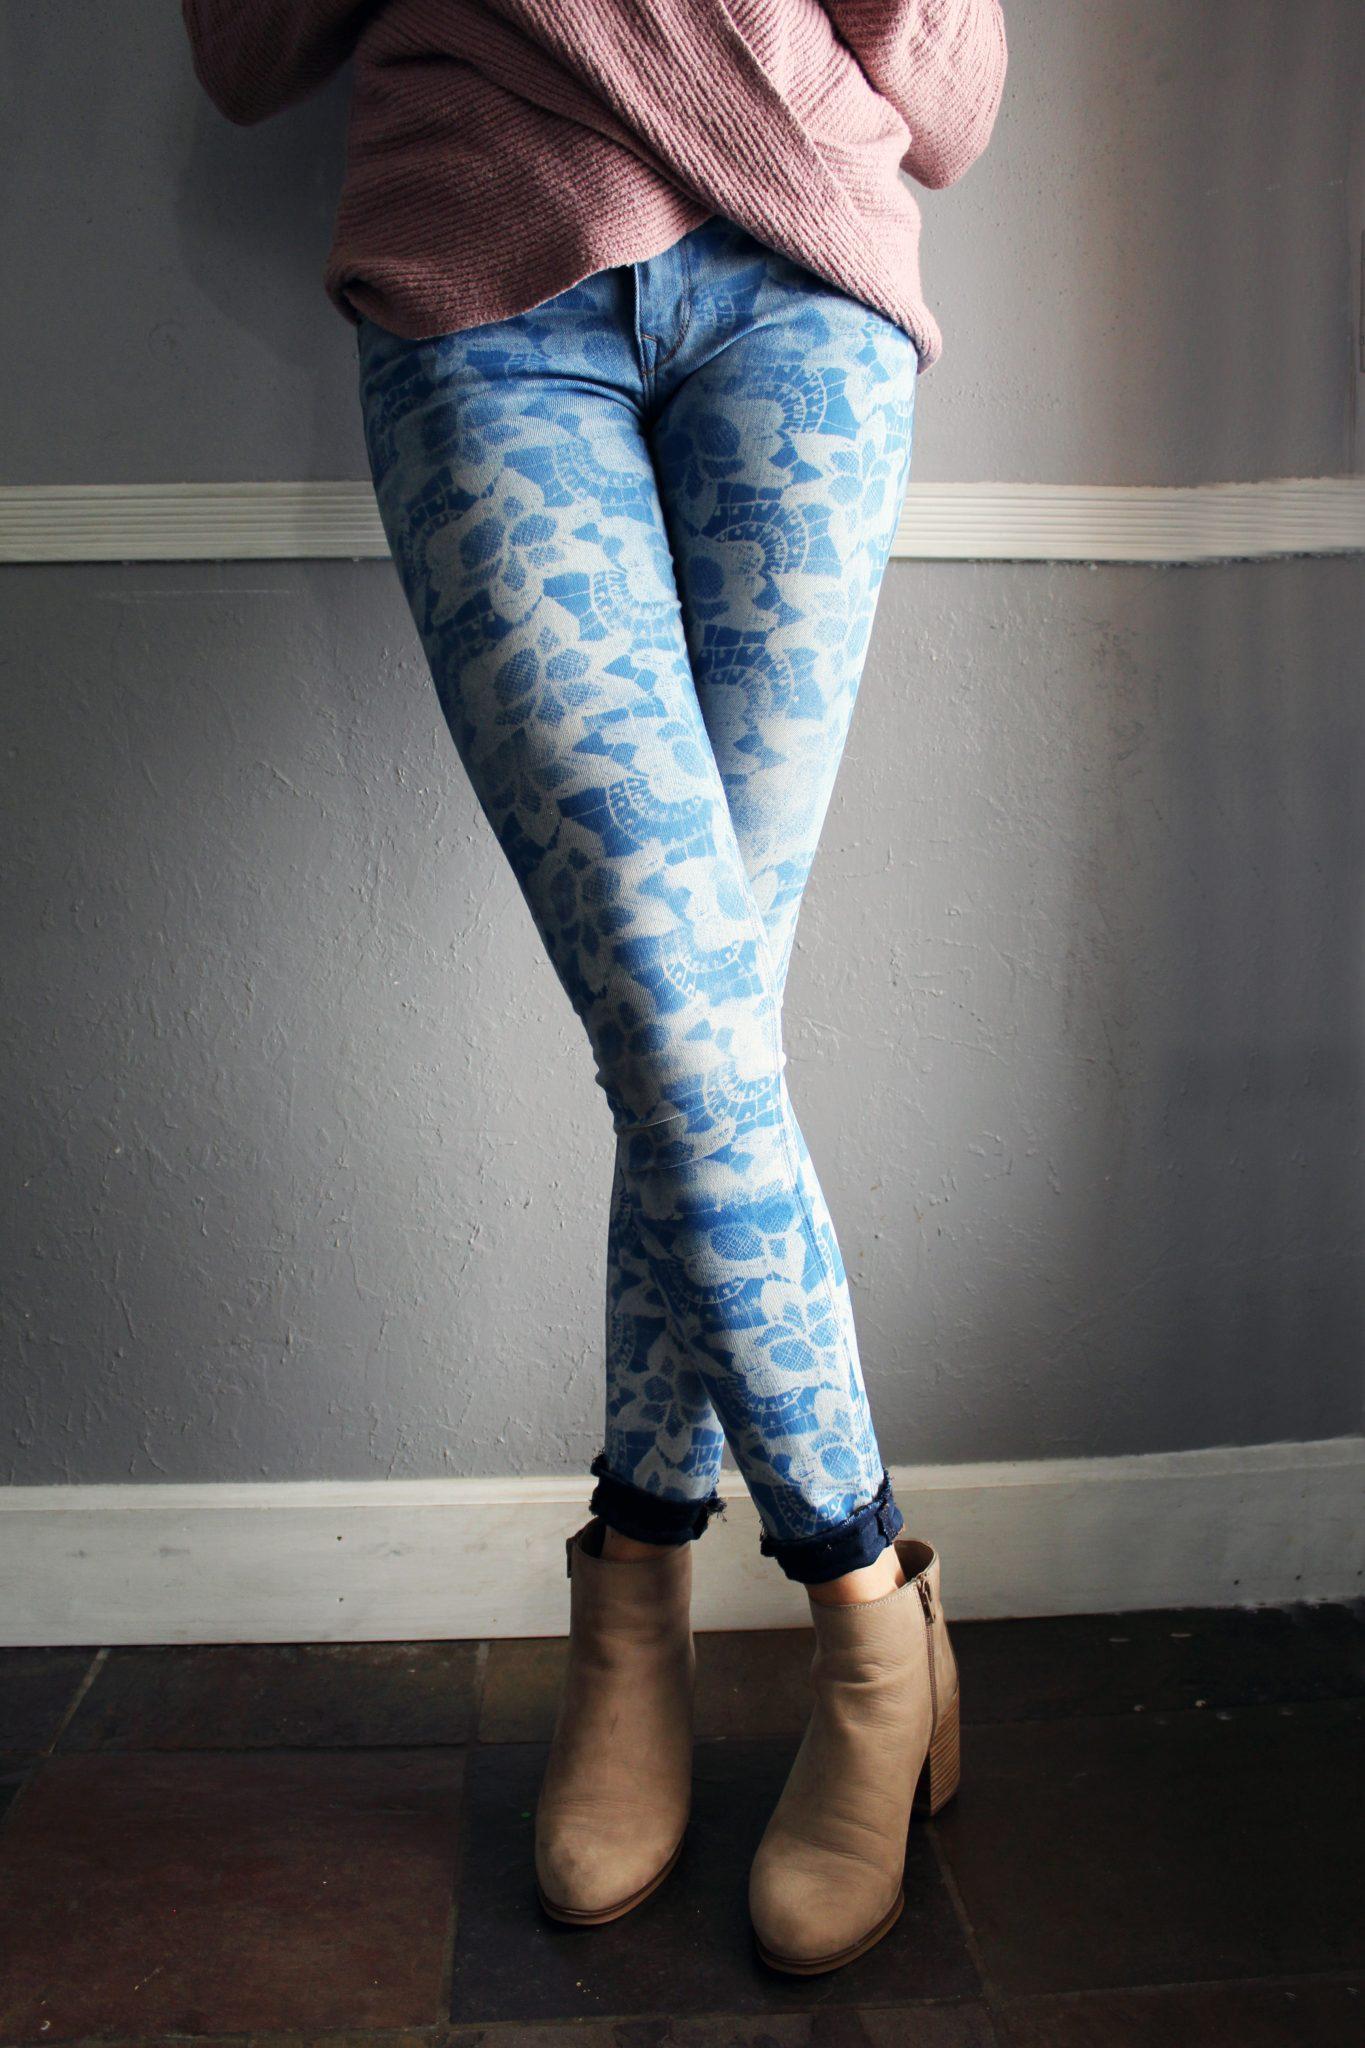 10 Minute DIY Lace Denim Jeans Refashion Tutorial Creative